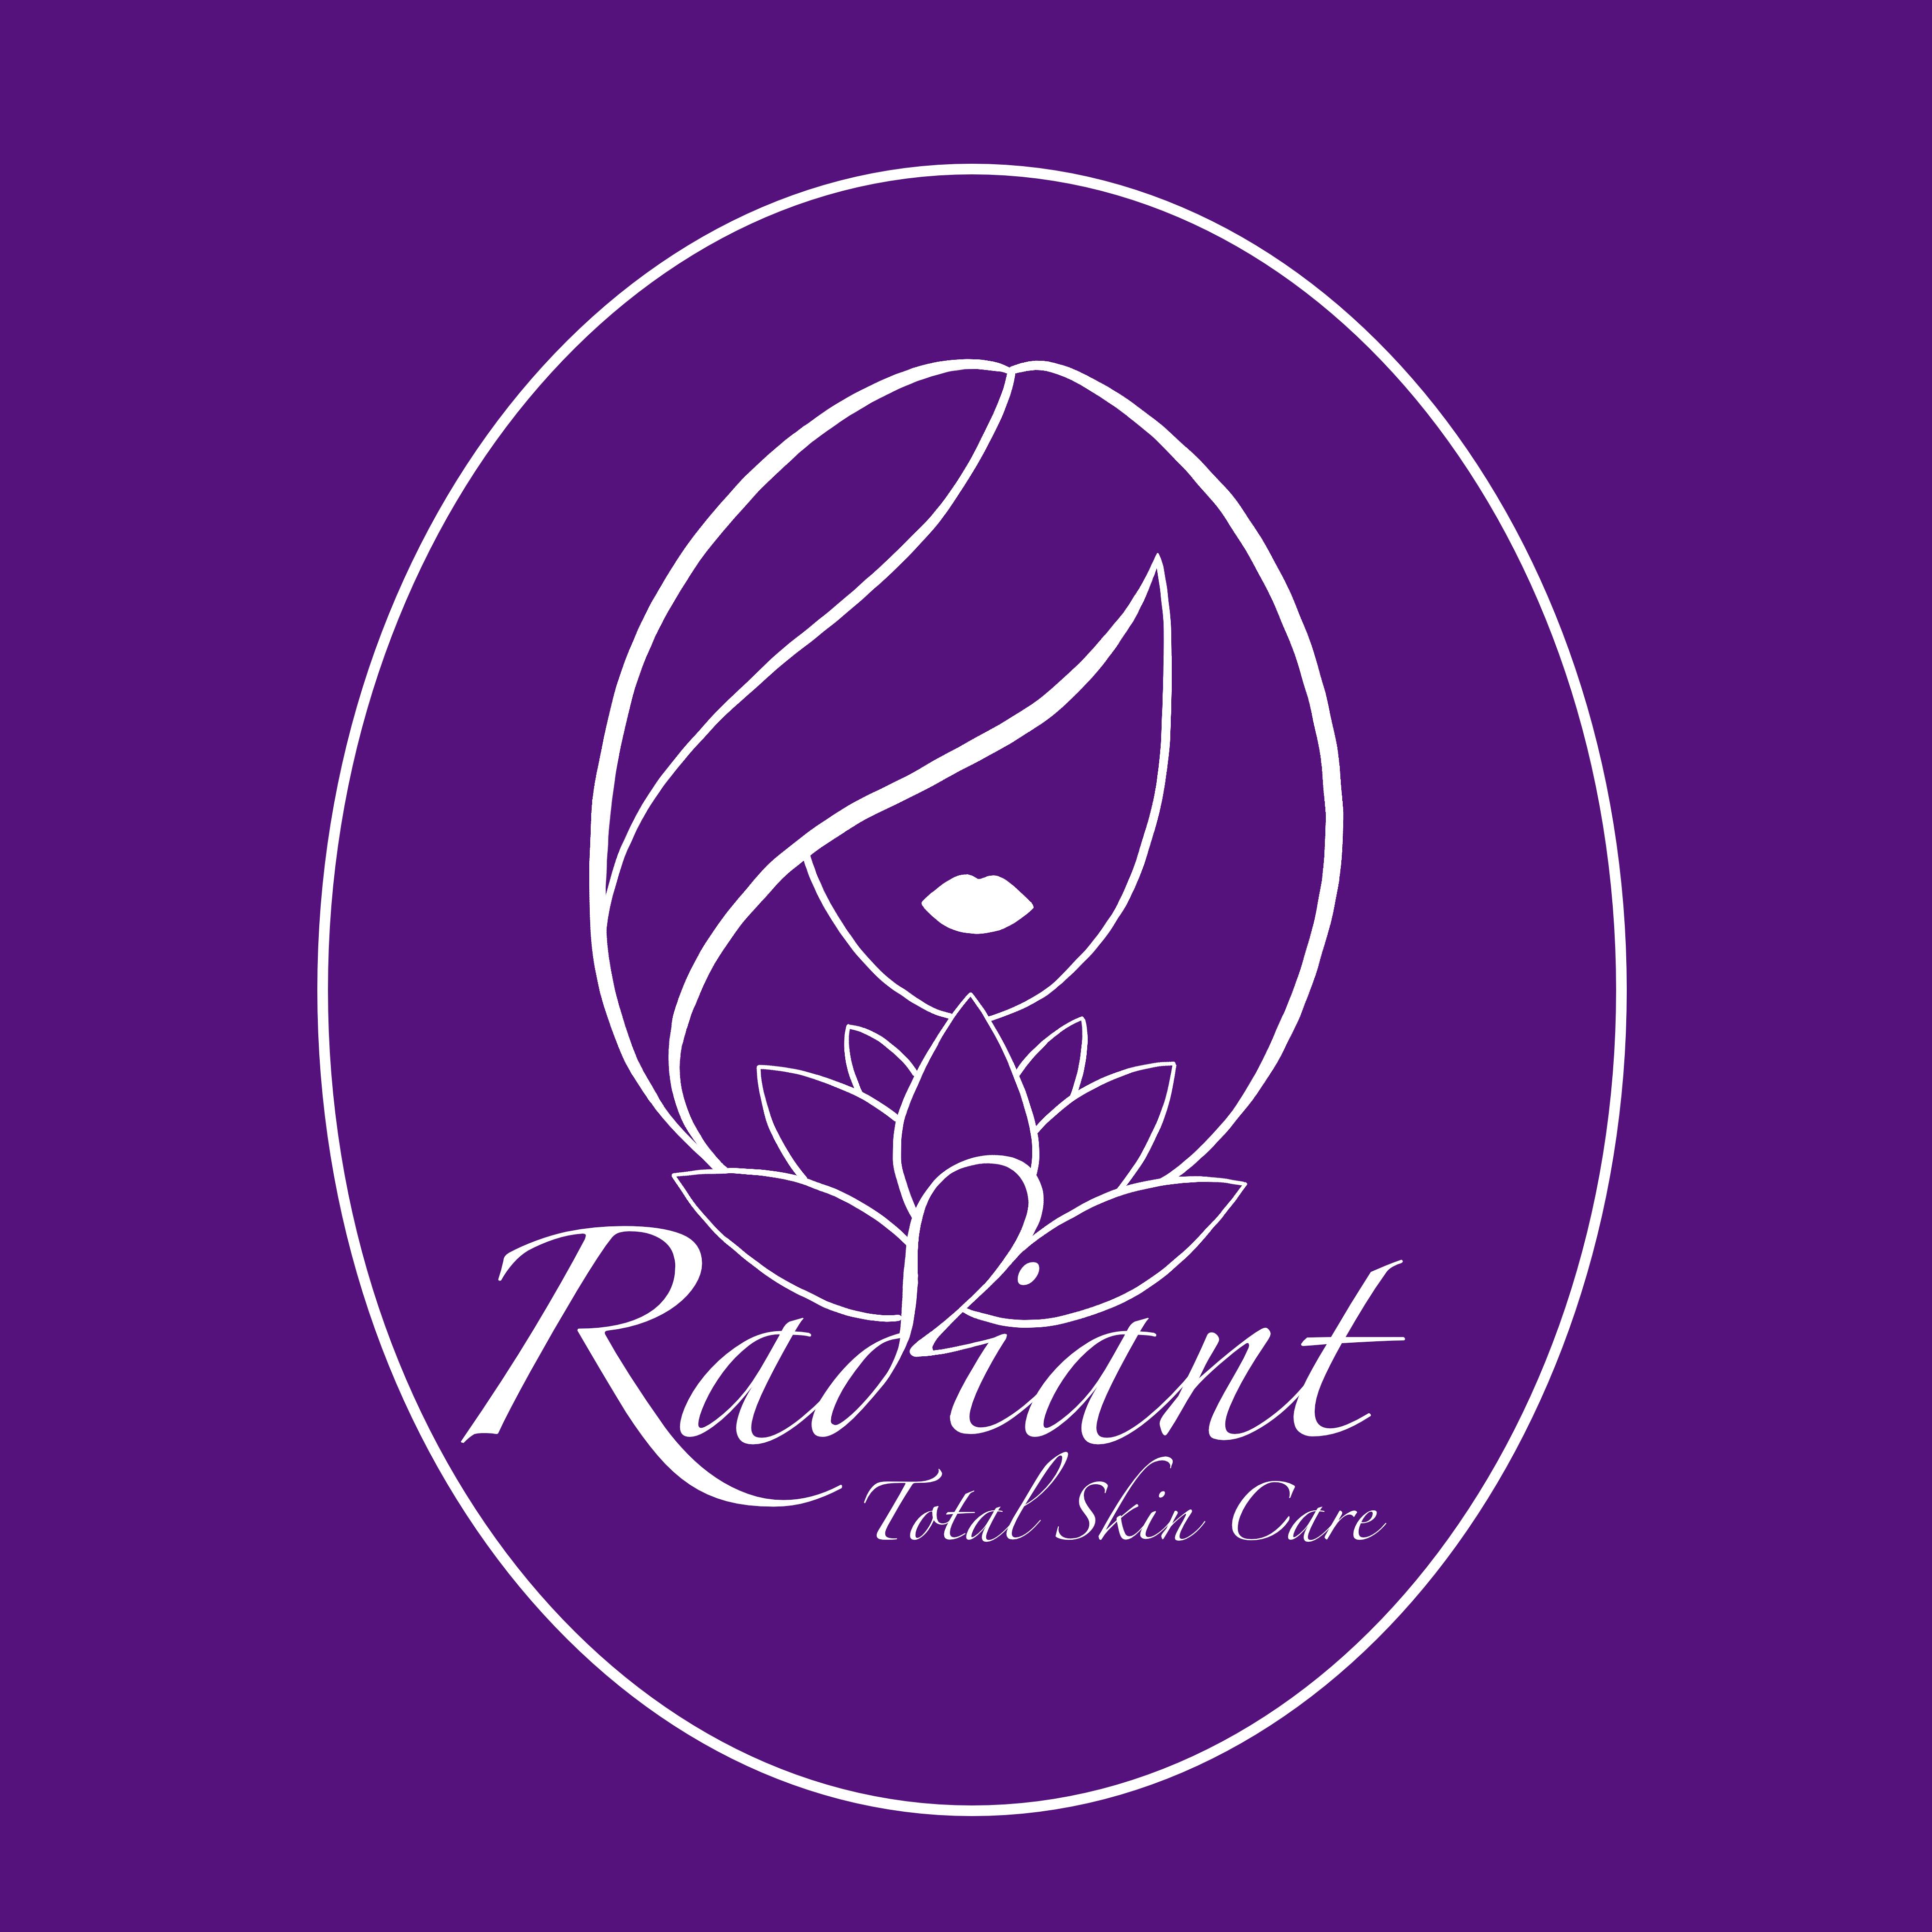 Radiant Total Skin Care